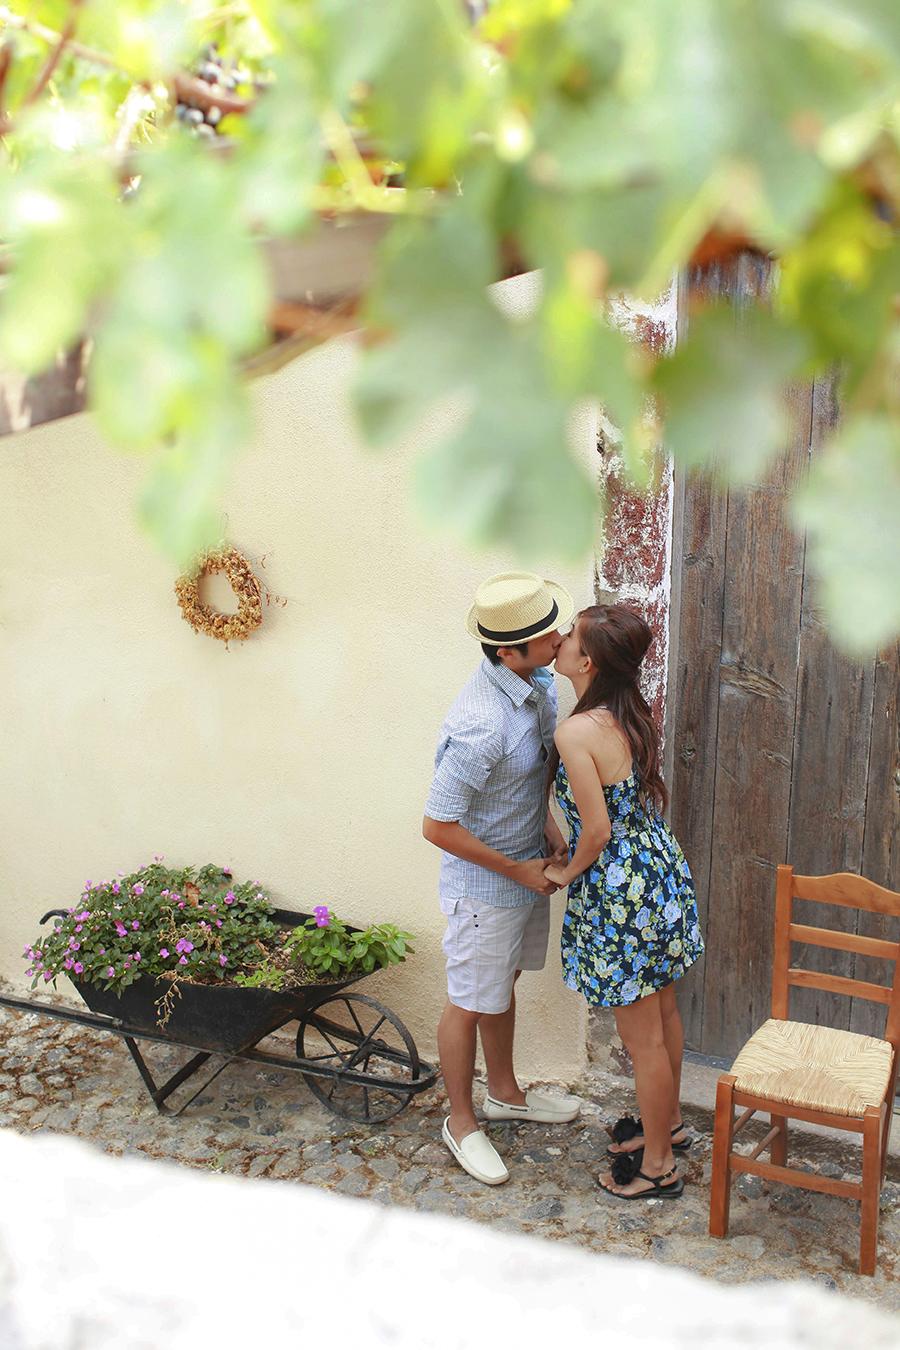 santorini greece . wedding photography by kurt ahs . 3119.jpg